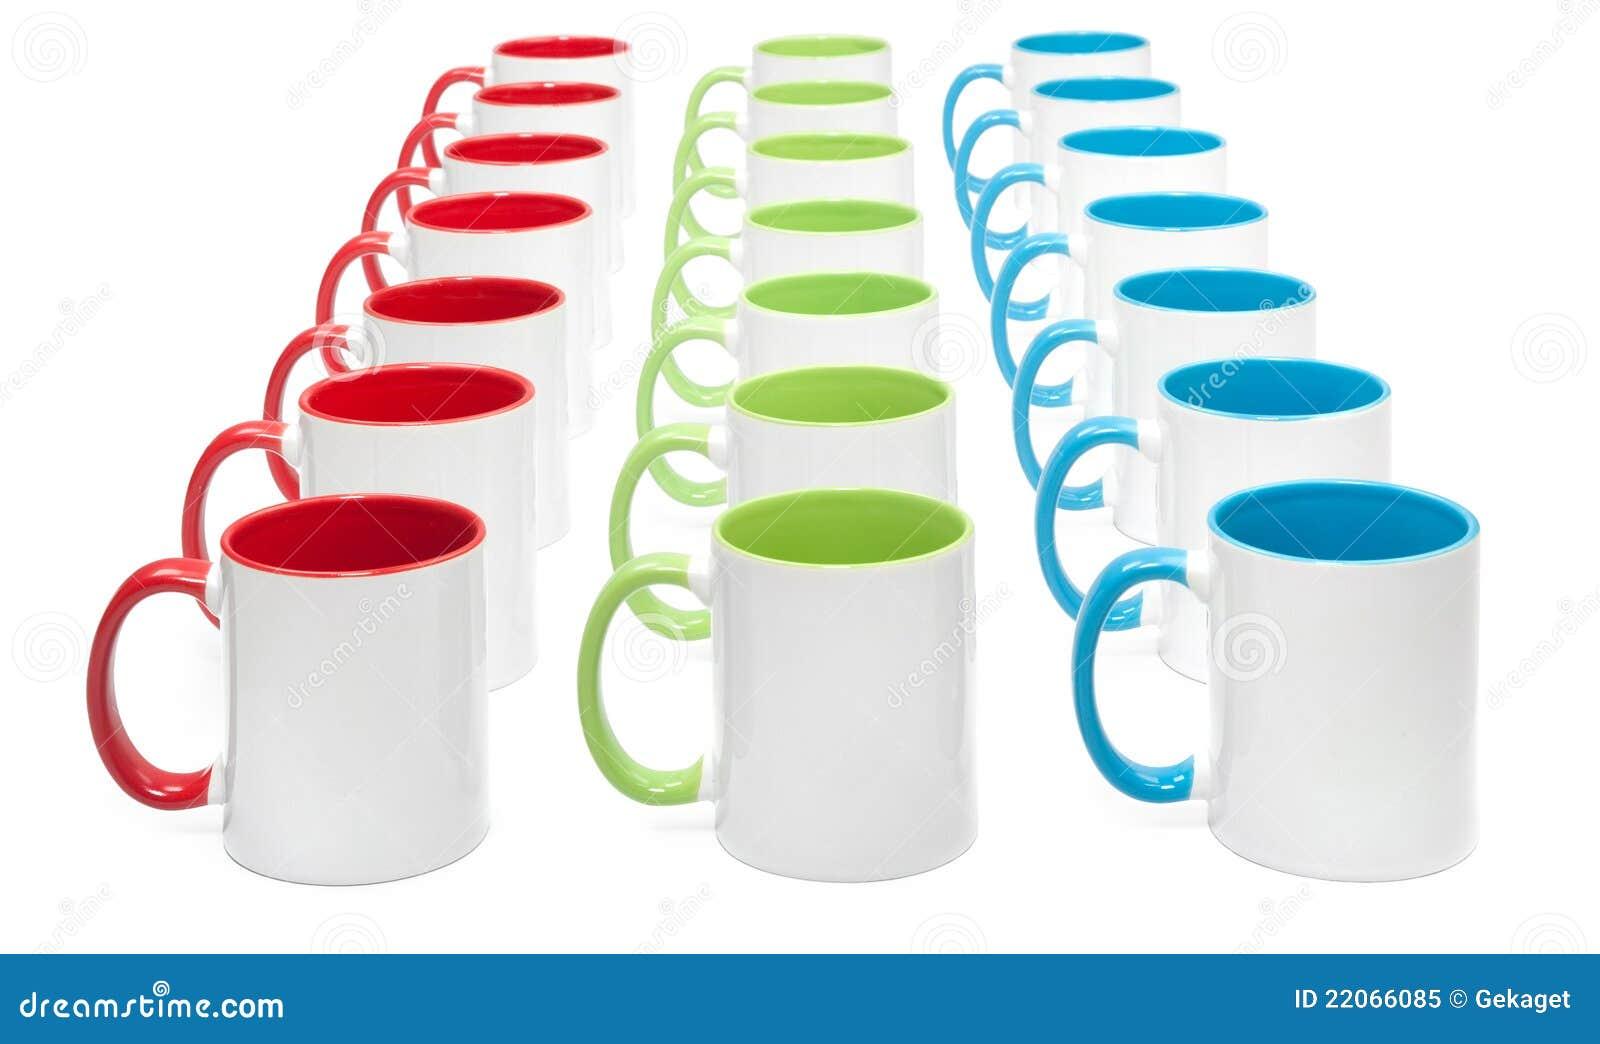 three rows of colorful mugs - Colorful Mugs